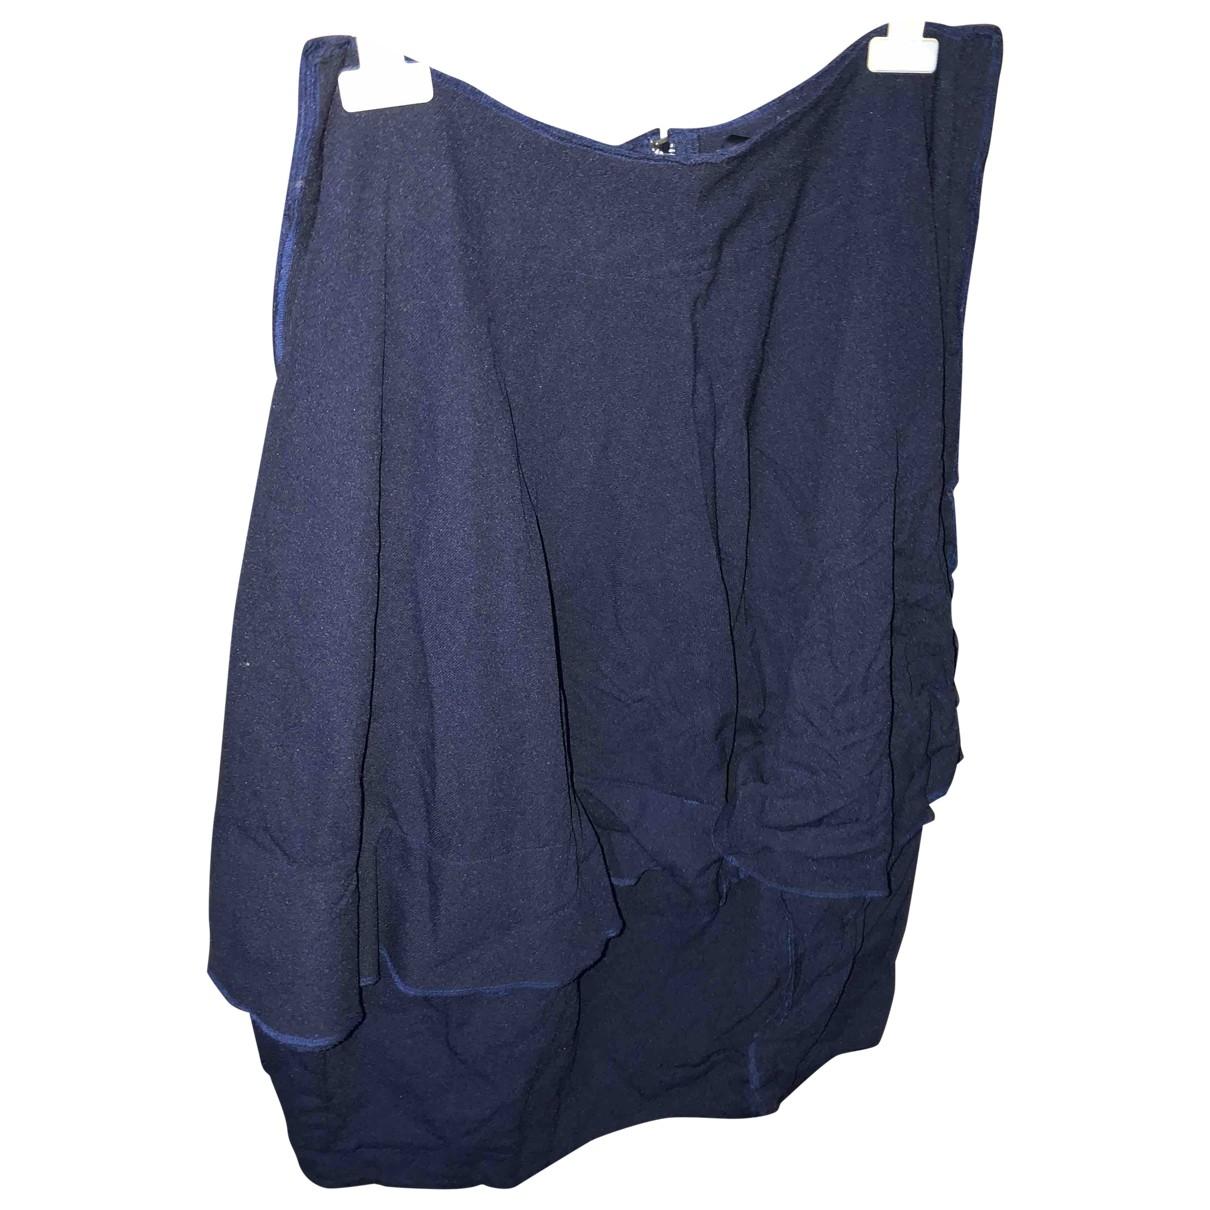 Comme Des Garcons \N Blue Cotton skirt for Women S International